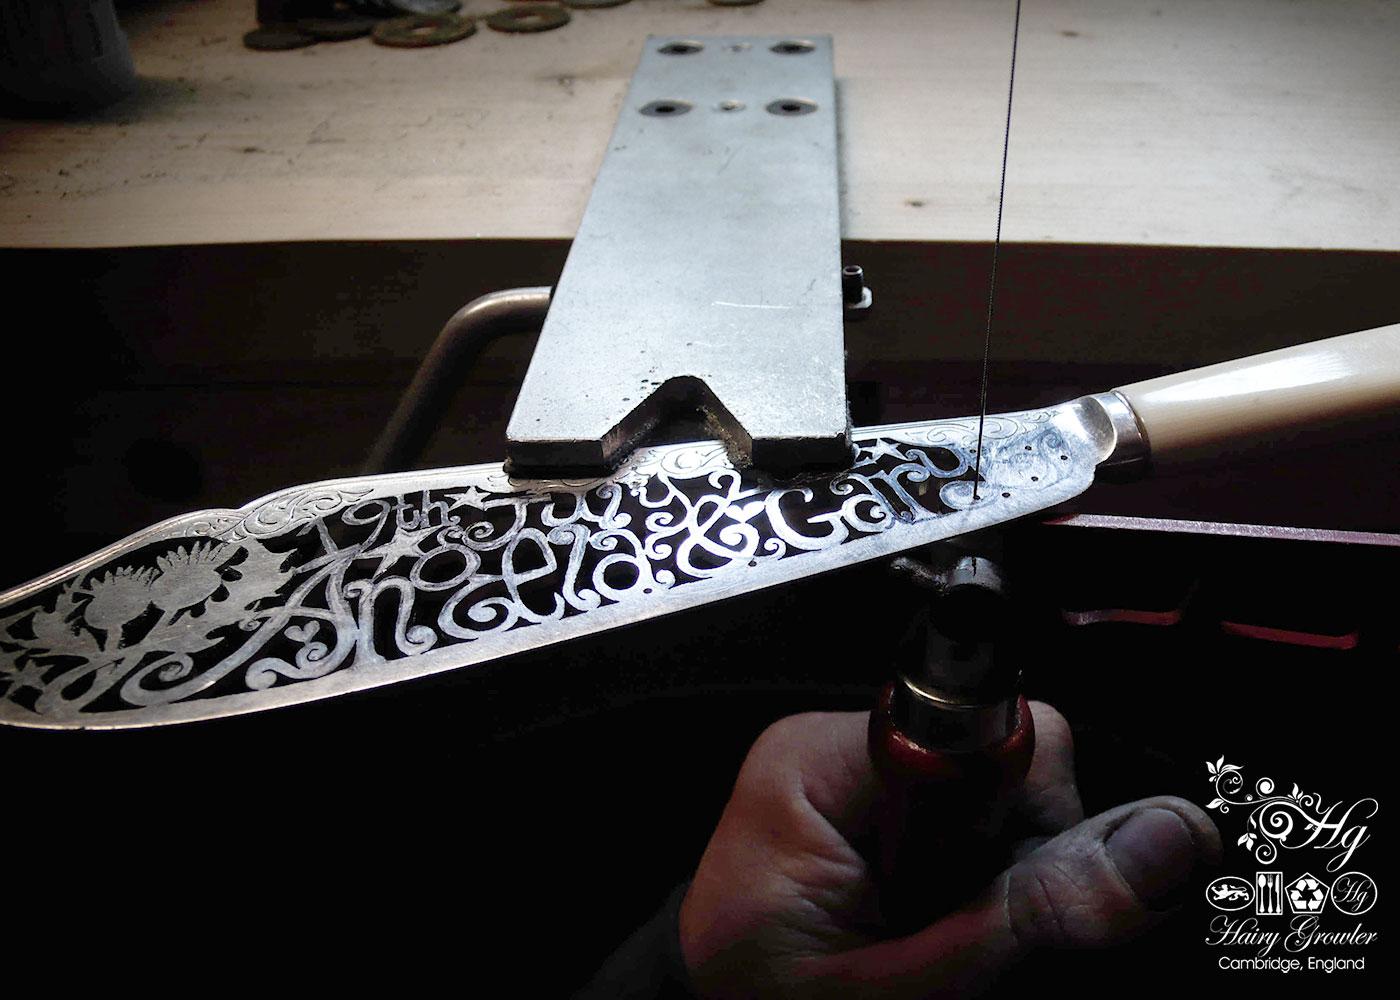 handcrafted and repurposed bespoke custom wedding-cake-knife